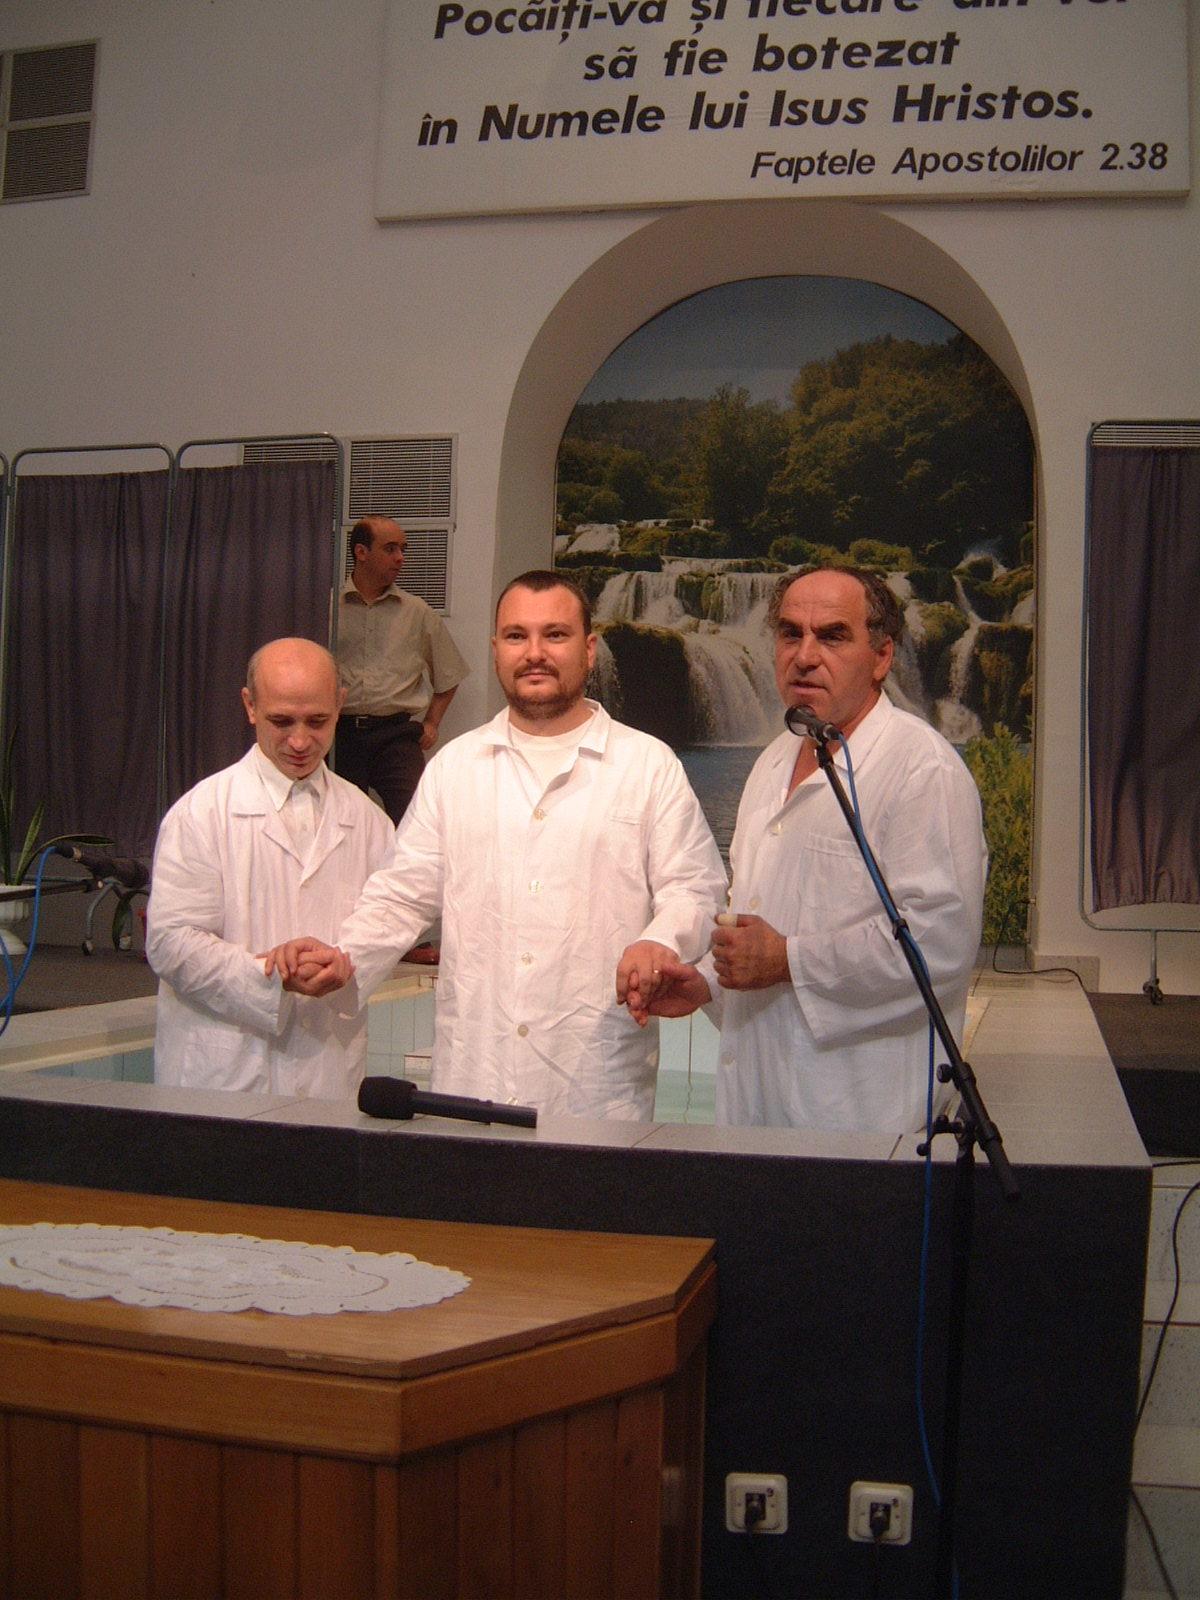 FRATELE BOGDAN BOICECOFSCHI IN TIMPUL BOTEZULUI - 22 AUGUST 2003